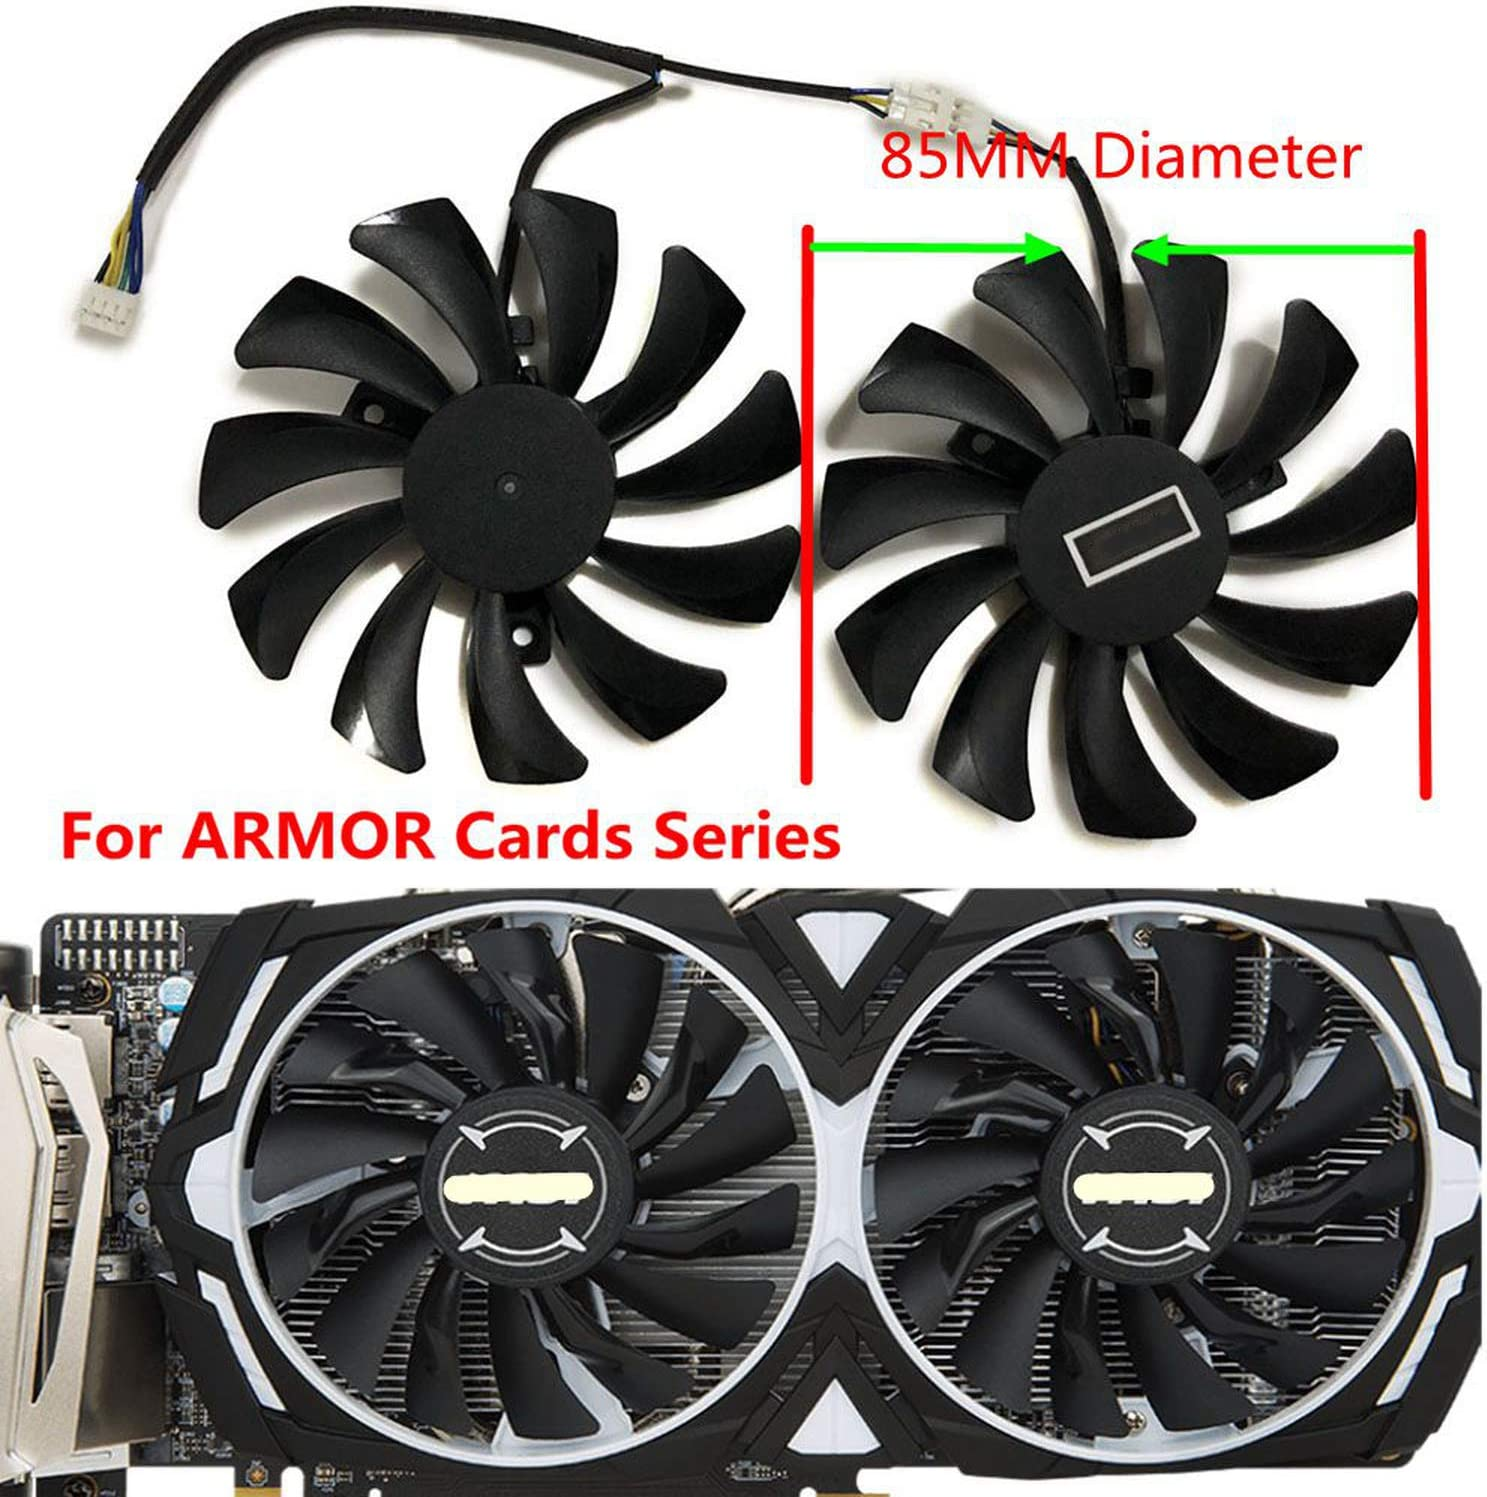 inRobert DIY Two Ball Bearing Graphic Card Fan 85mm Diameter 40x40x40mm Cooling Fan For MSI Gigabyte Sapphire Zotac XFX Mining GPU 1 pair